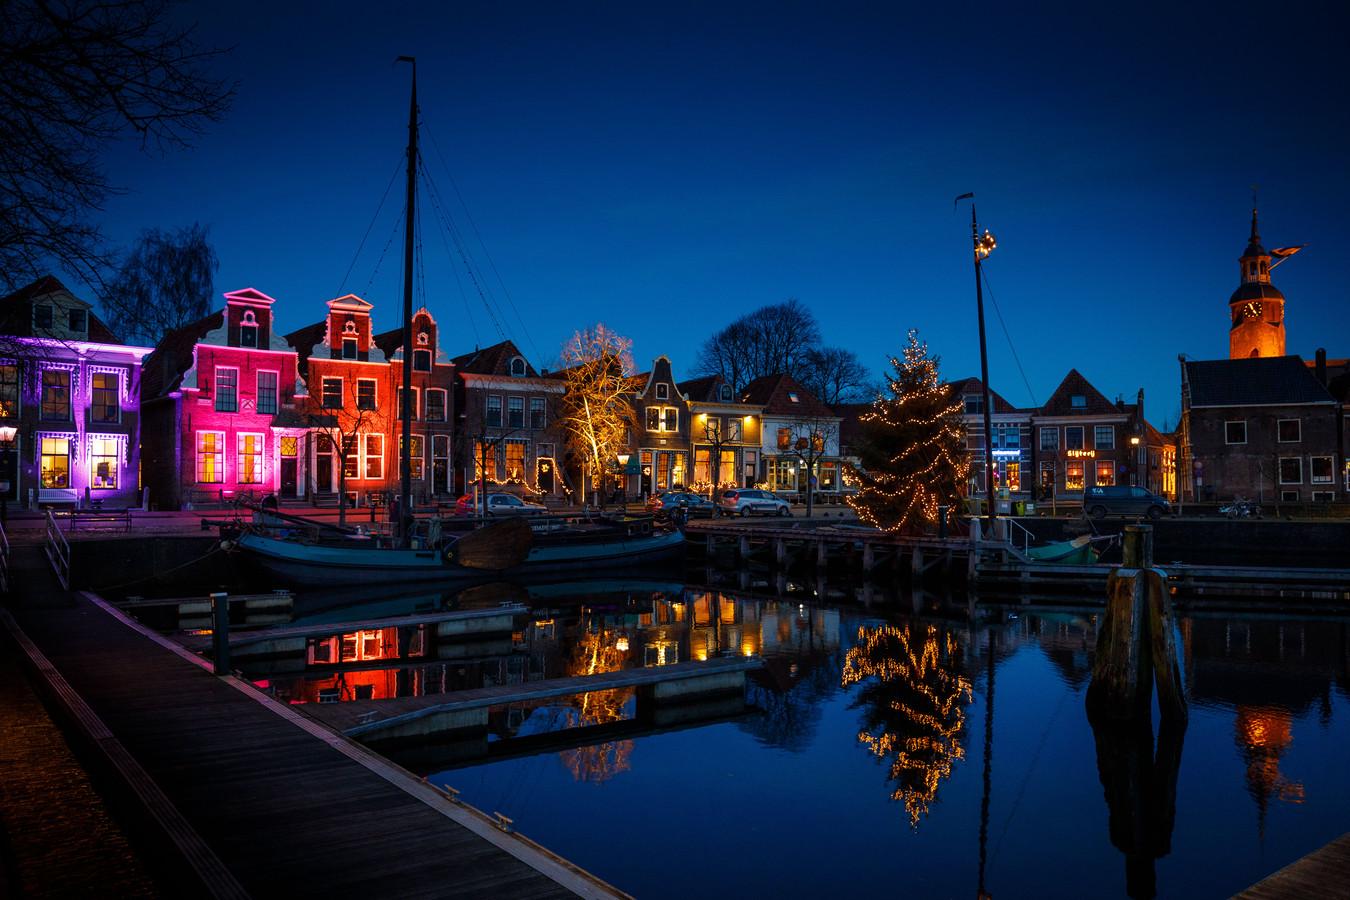 DS-2019-8950 - Blokzijl lights festival lichtjesfestival rond de kolk©Wilbert Bijzitter